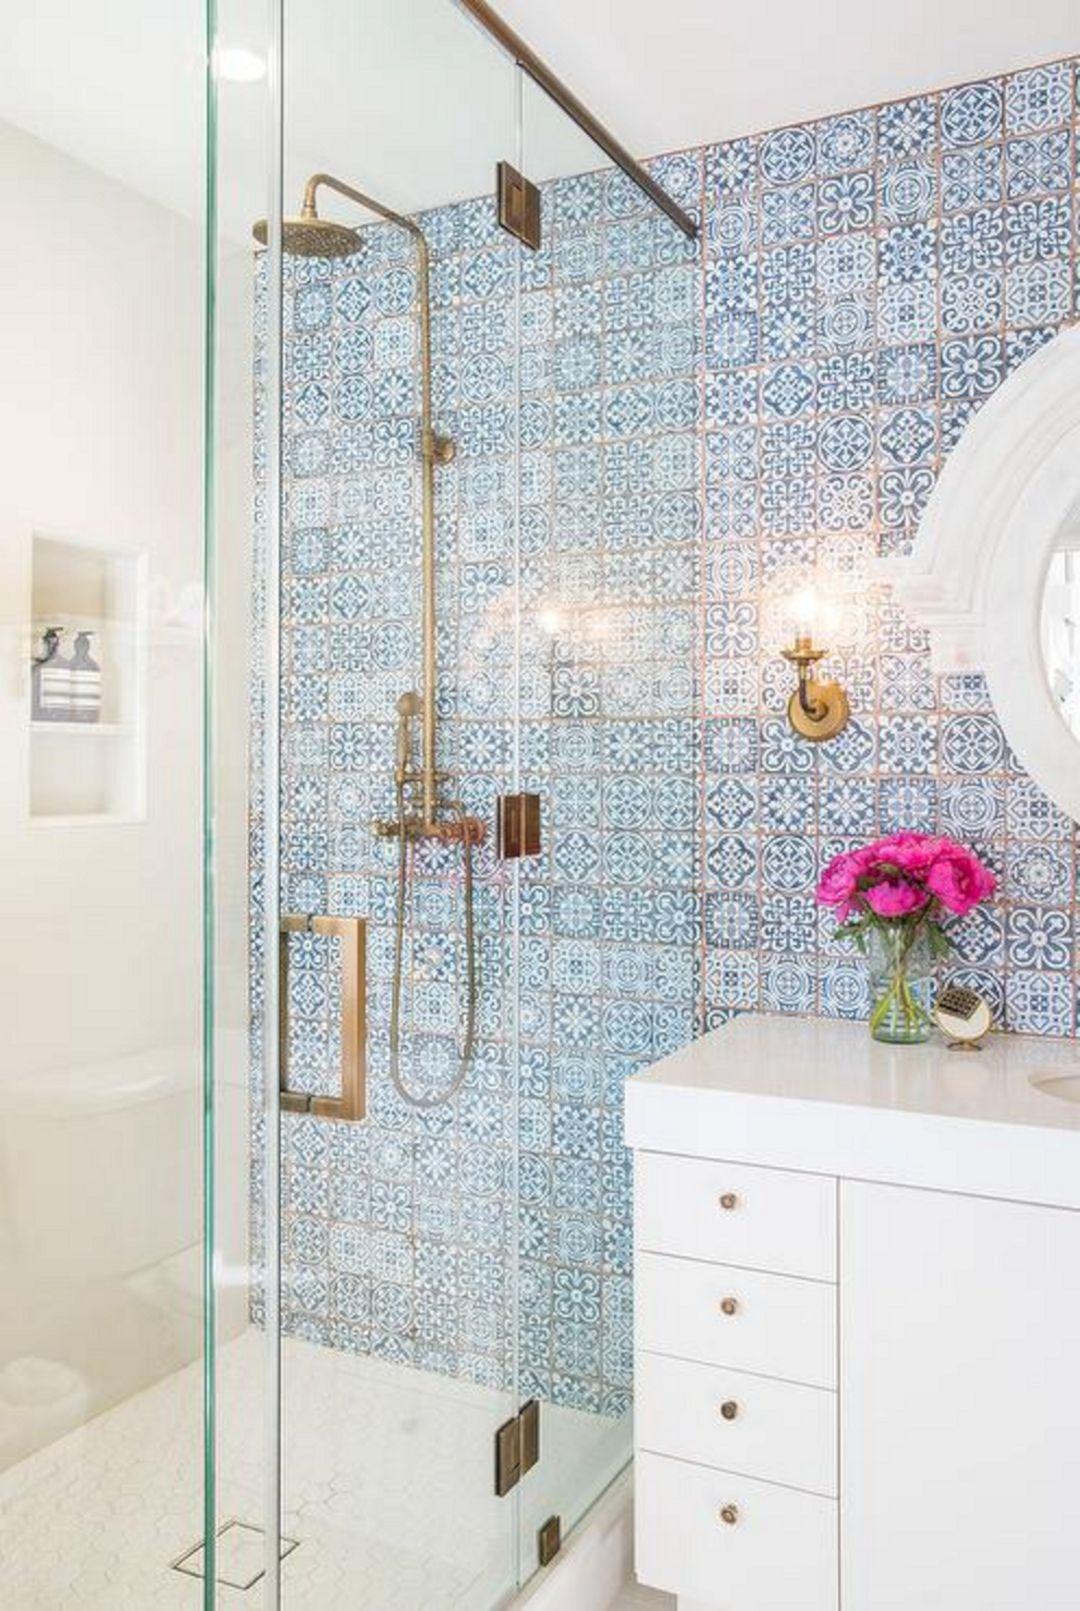 33+ Amazing Mirror Bathroom Tiles For Bathroom Looks Luxurious ...